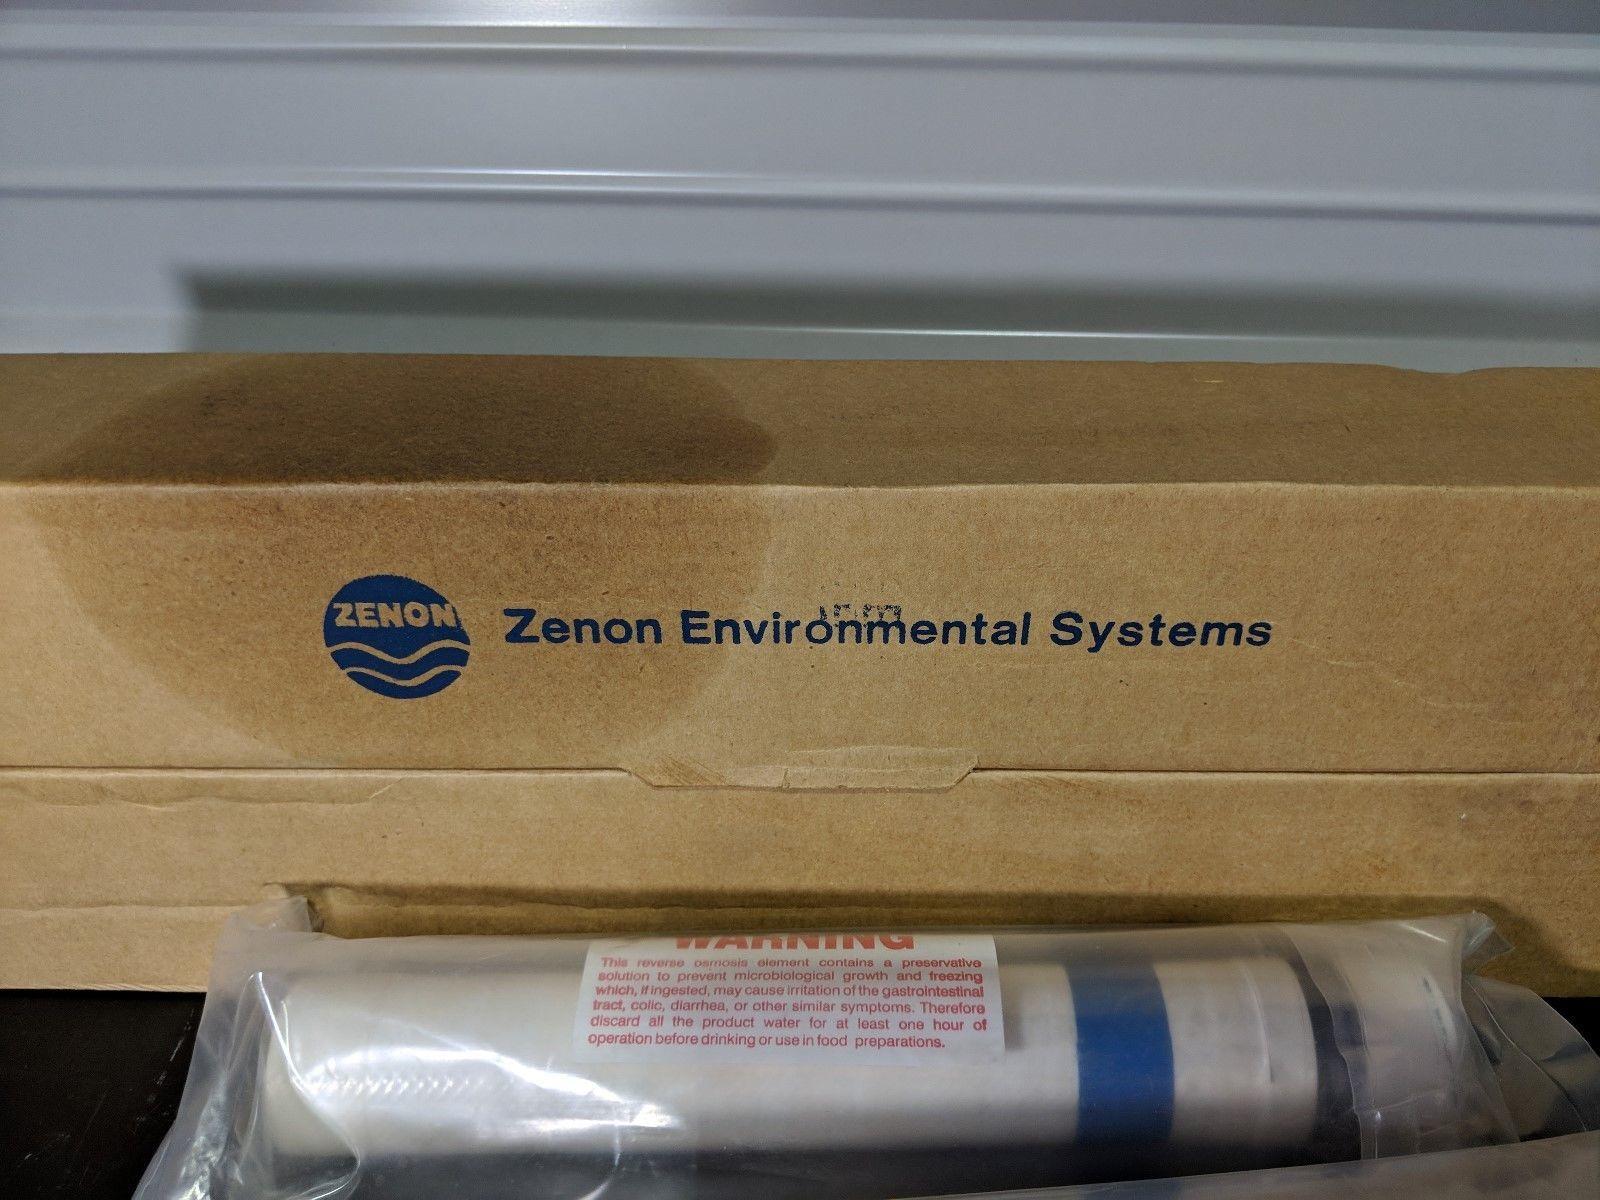 Zenon Environmental Systems EW2012T Reverse Osmosis Filter Element 2-Pack